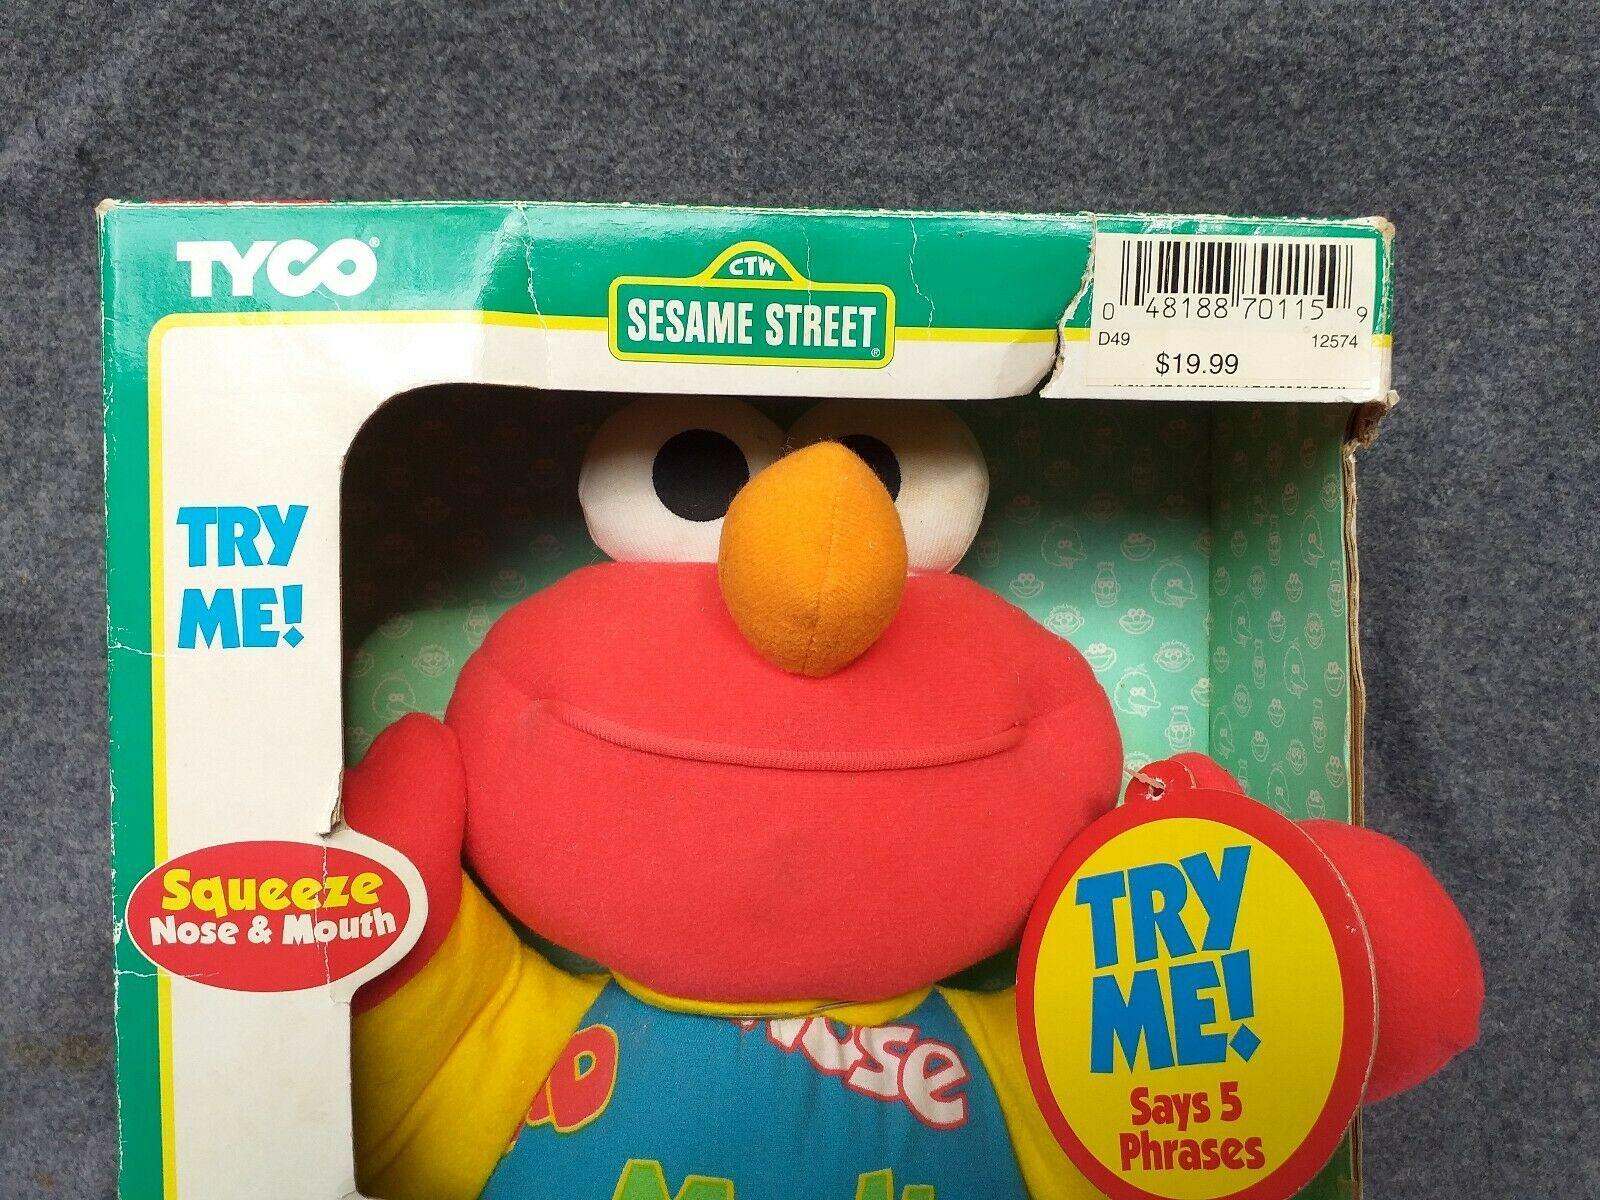 New Box Vintage Teach Me Elmo Original 90's 1996 Tyco Plush Doll Sesame Street image 3